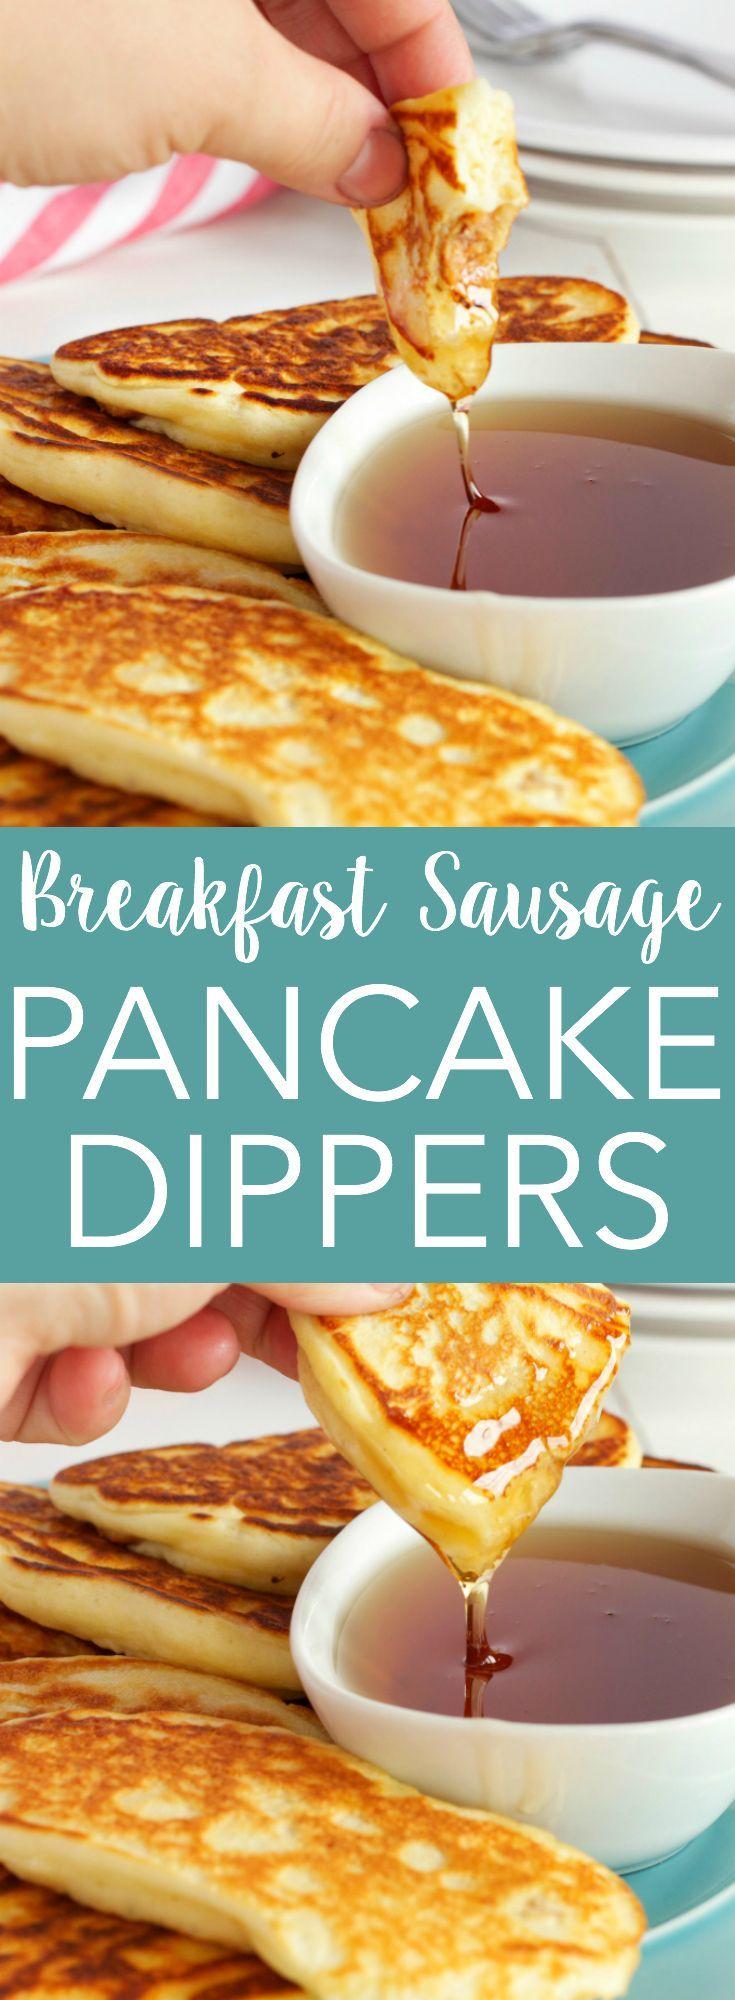 Breakfast Sausage Pancake Dippers Finger FoodsPerfect BreakfastBreakfast IdeasBreakfast RecipesBreakfast